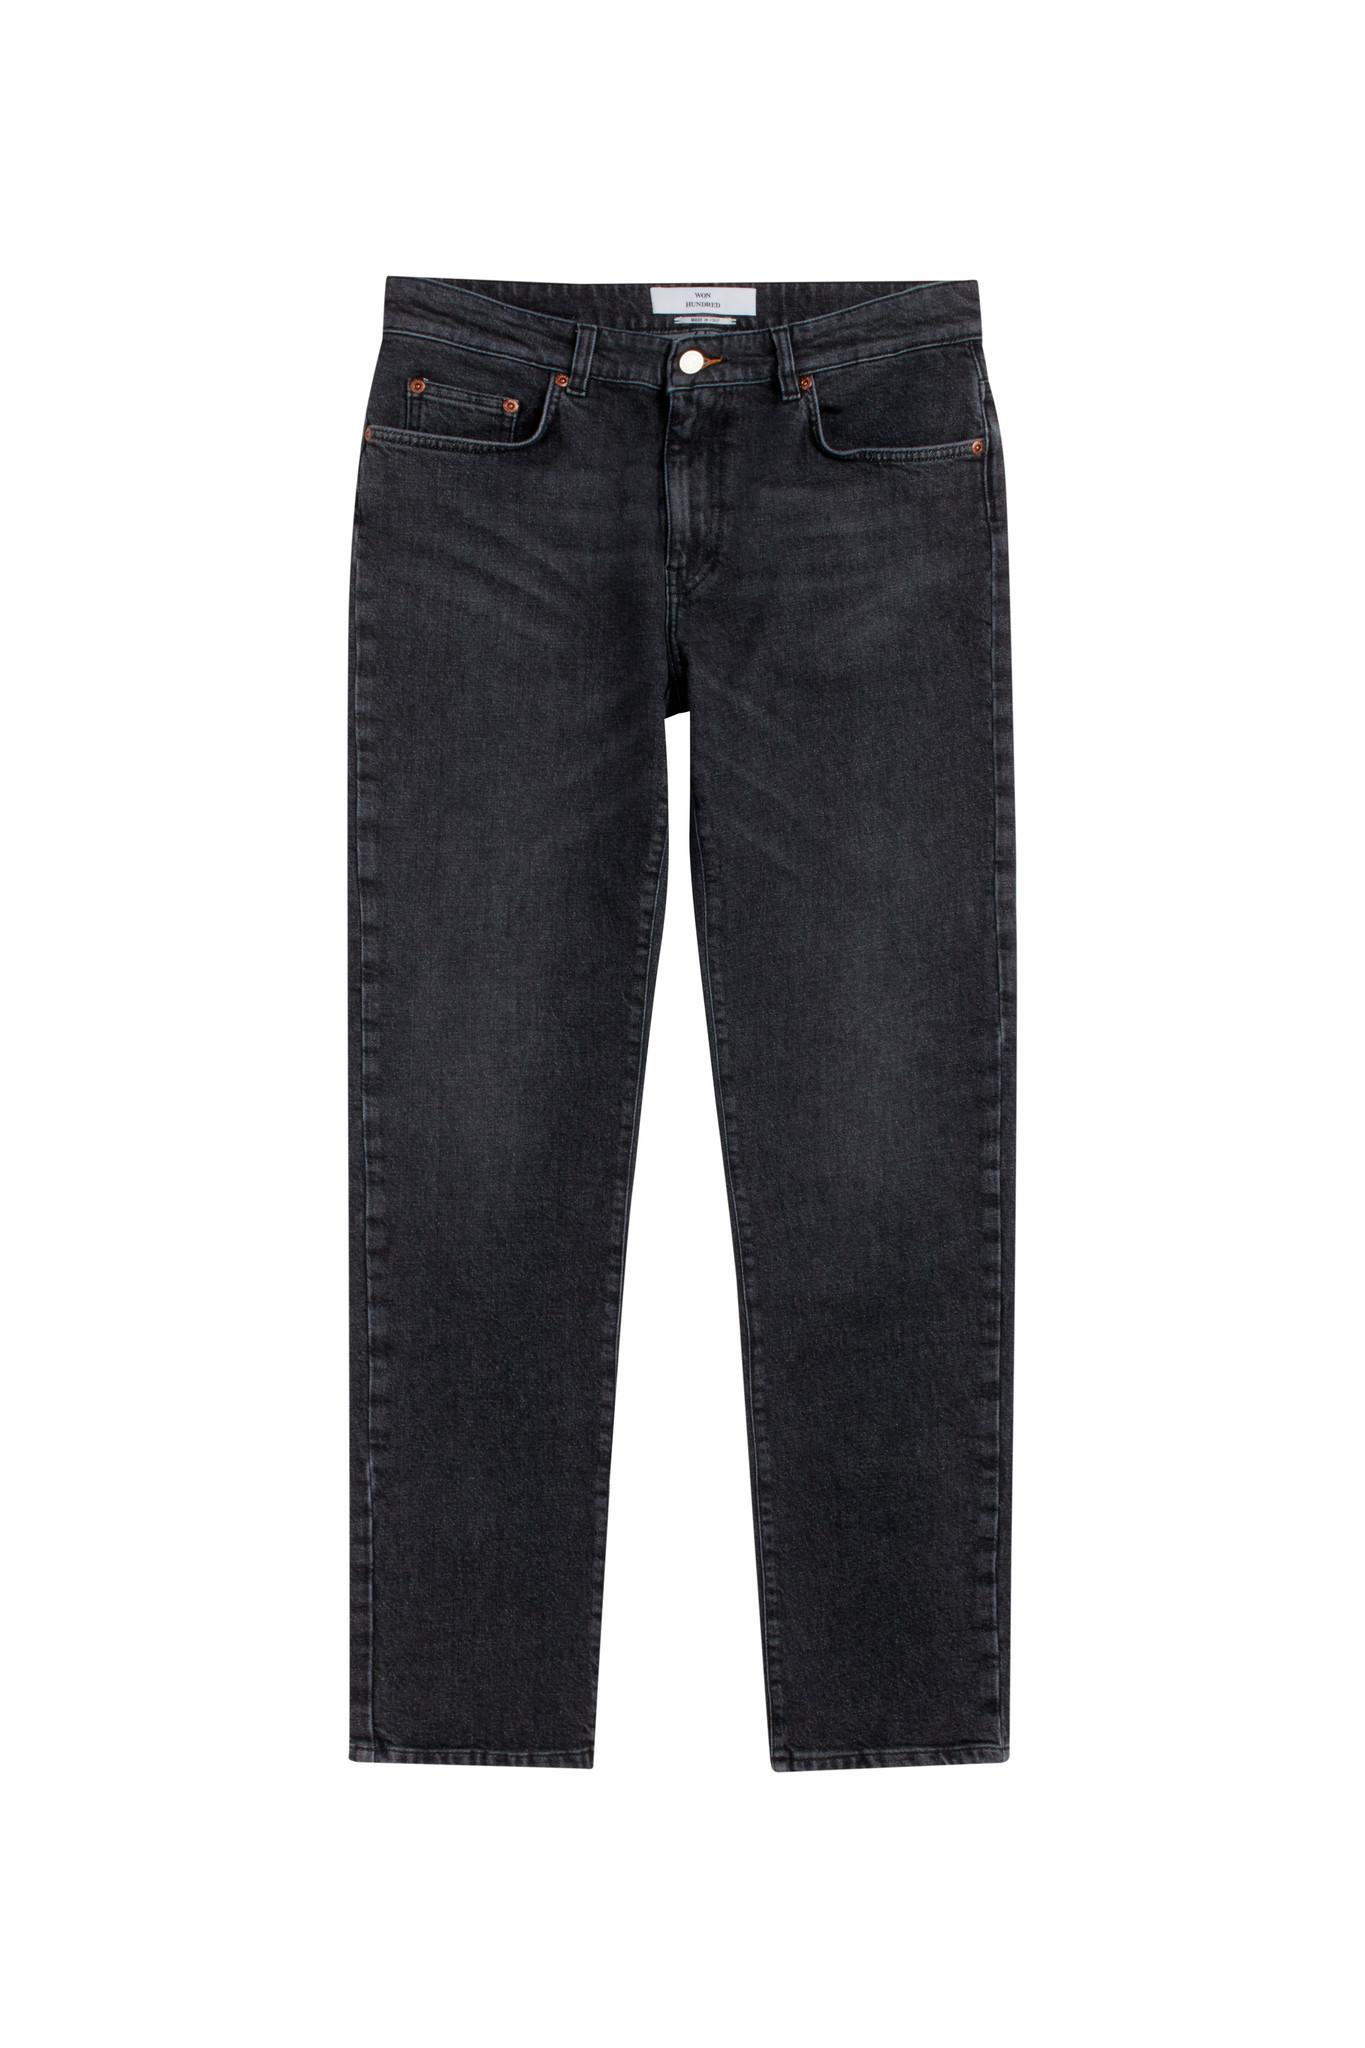 Dean B Jeans - Mad Black 4-1